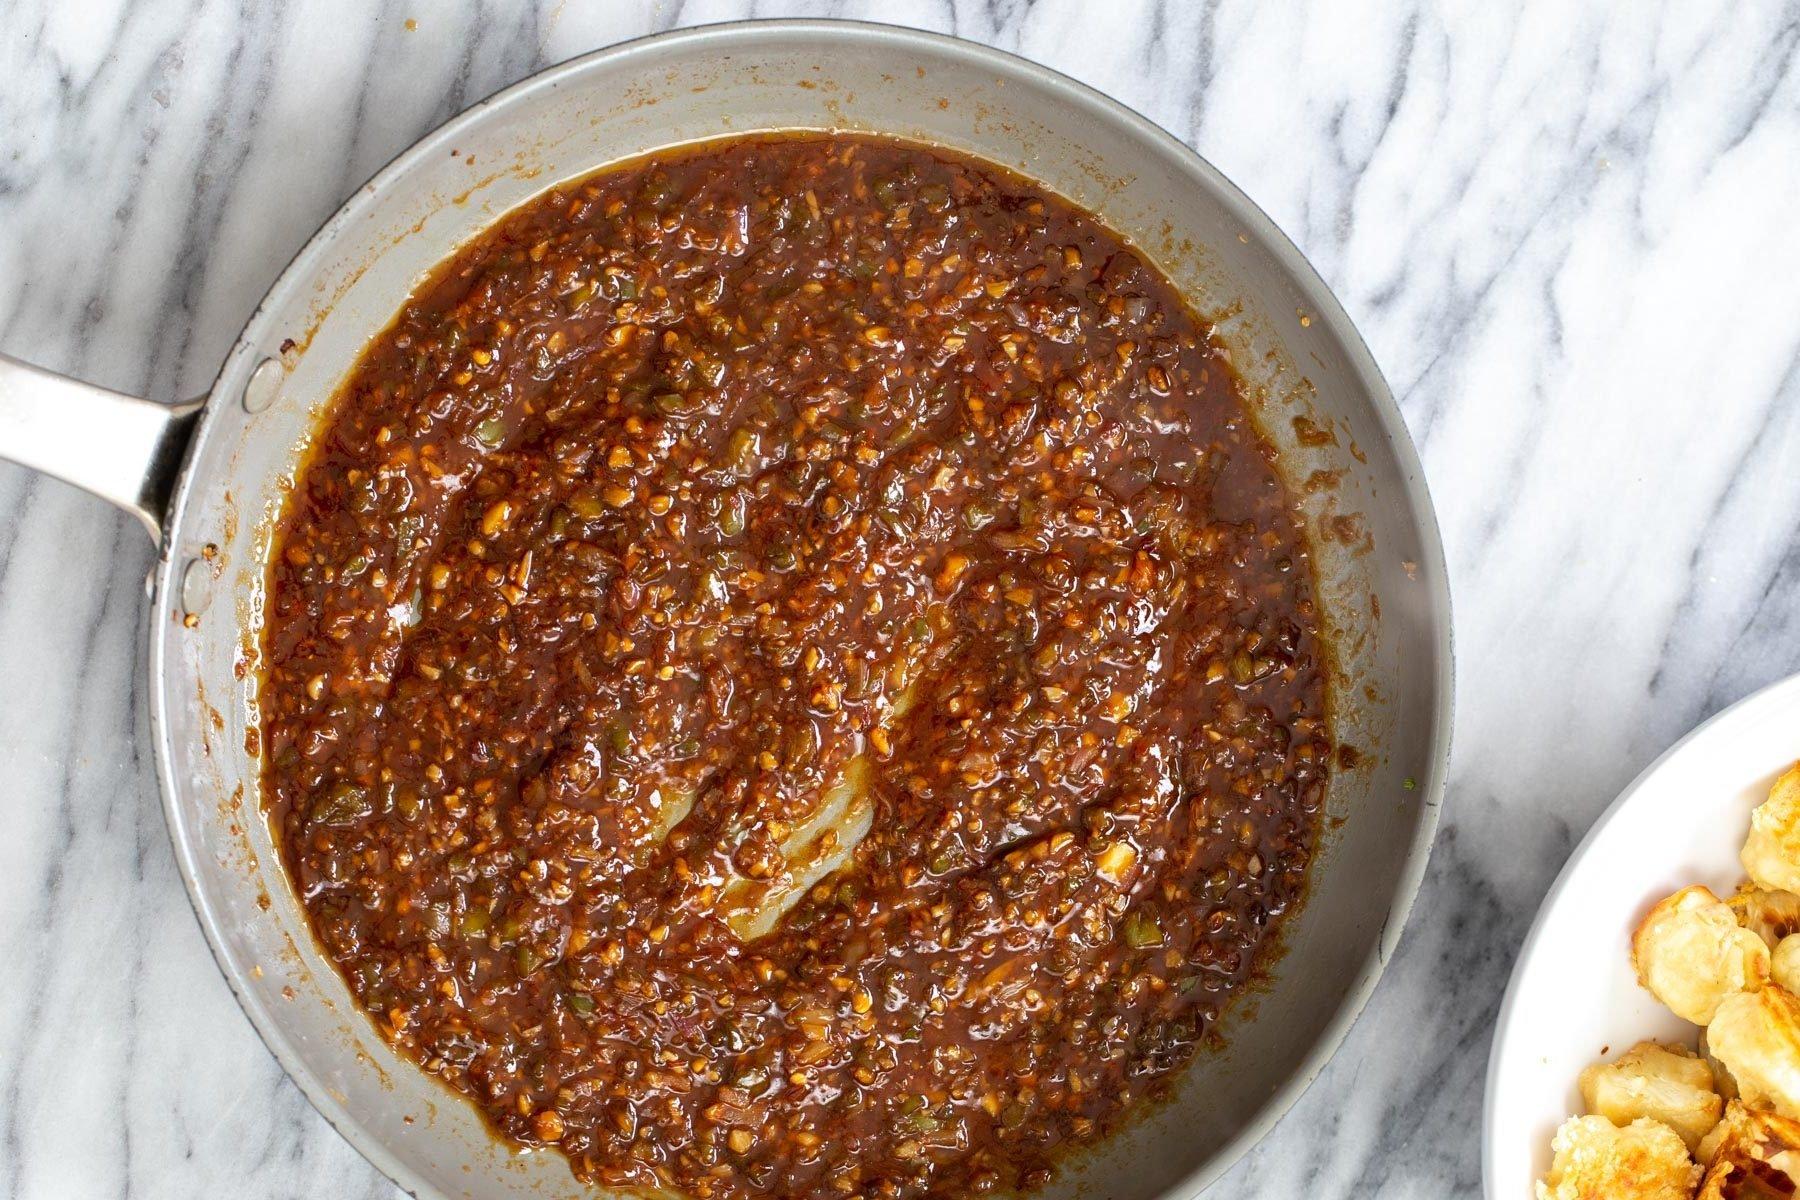 cauliflower manchurian sauce in a saucepan